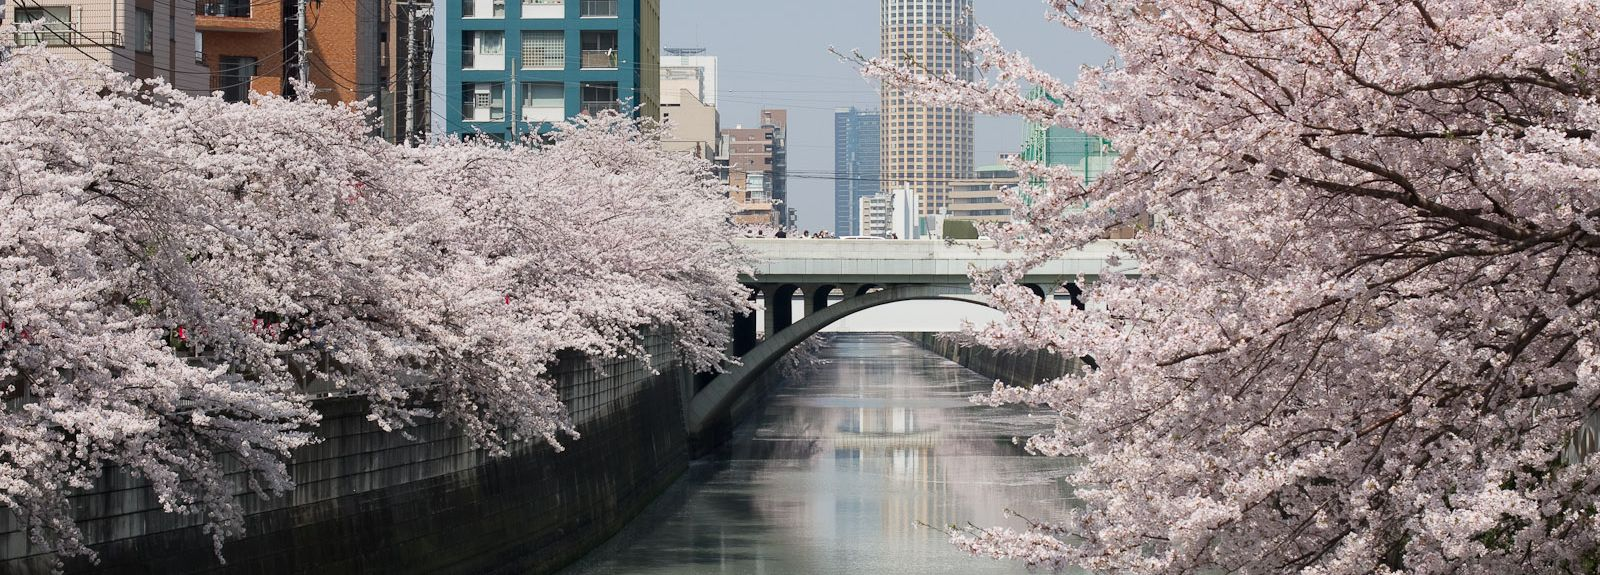 Tokio DisneySea®, Urayasu, Chiba (prefectura), Japón